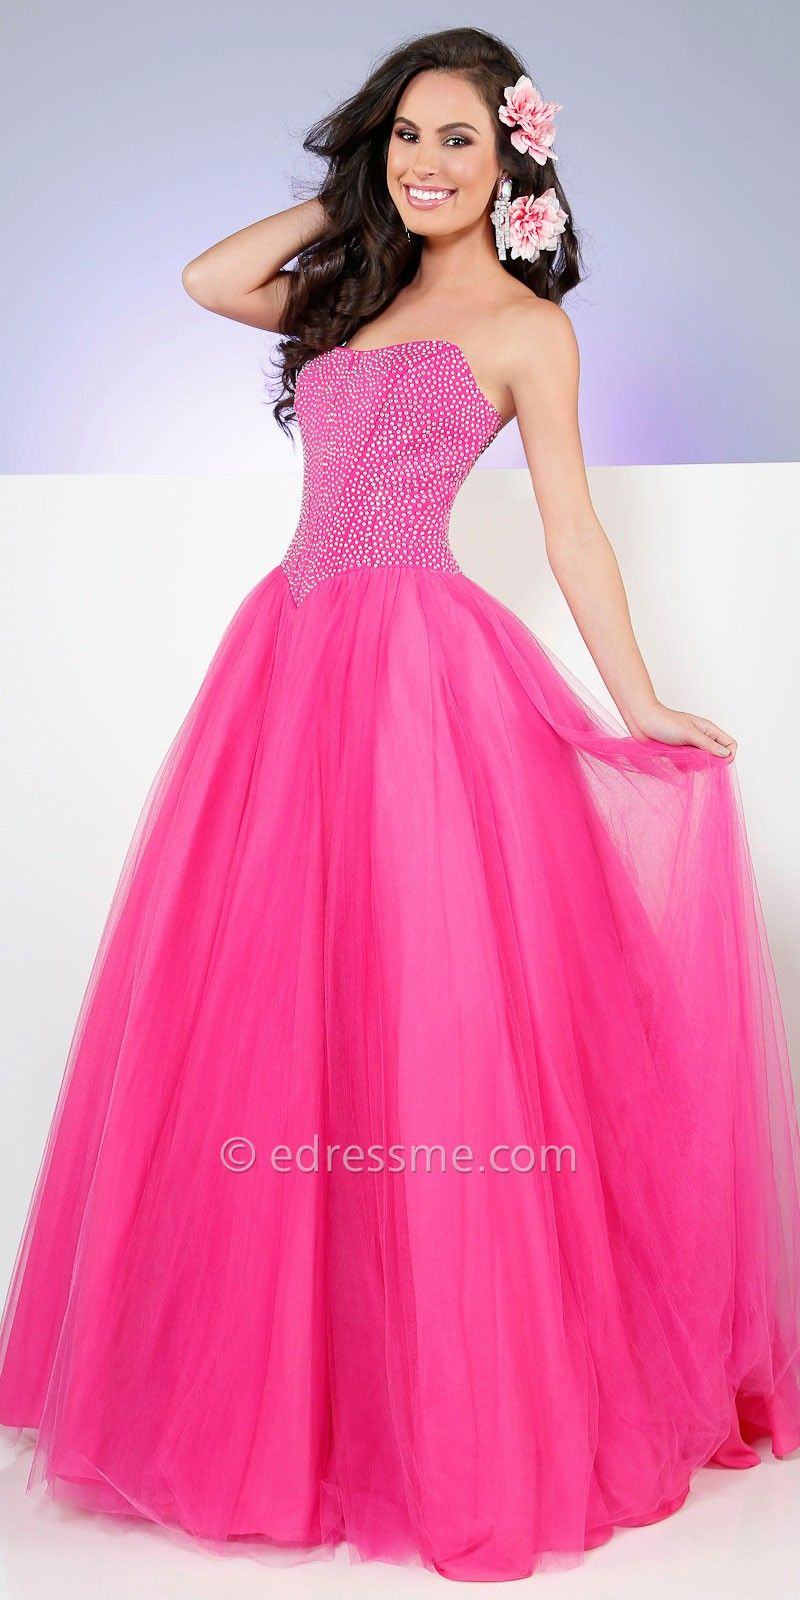 Strapless Rhinestone Tulle Prom Dress by Mon Cheri Le Gala | 15 anos ...